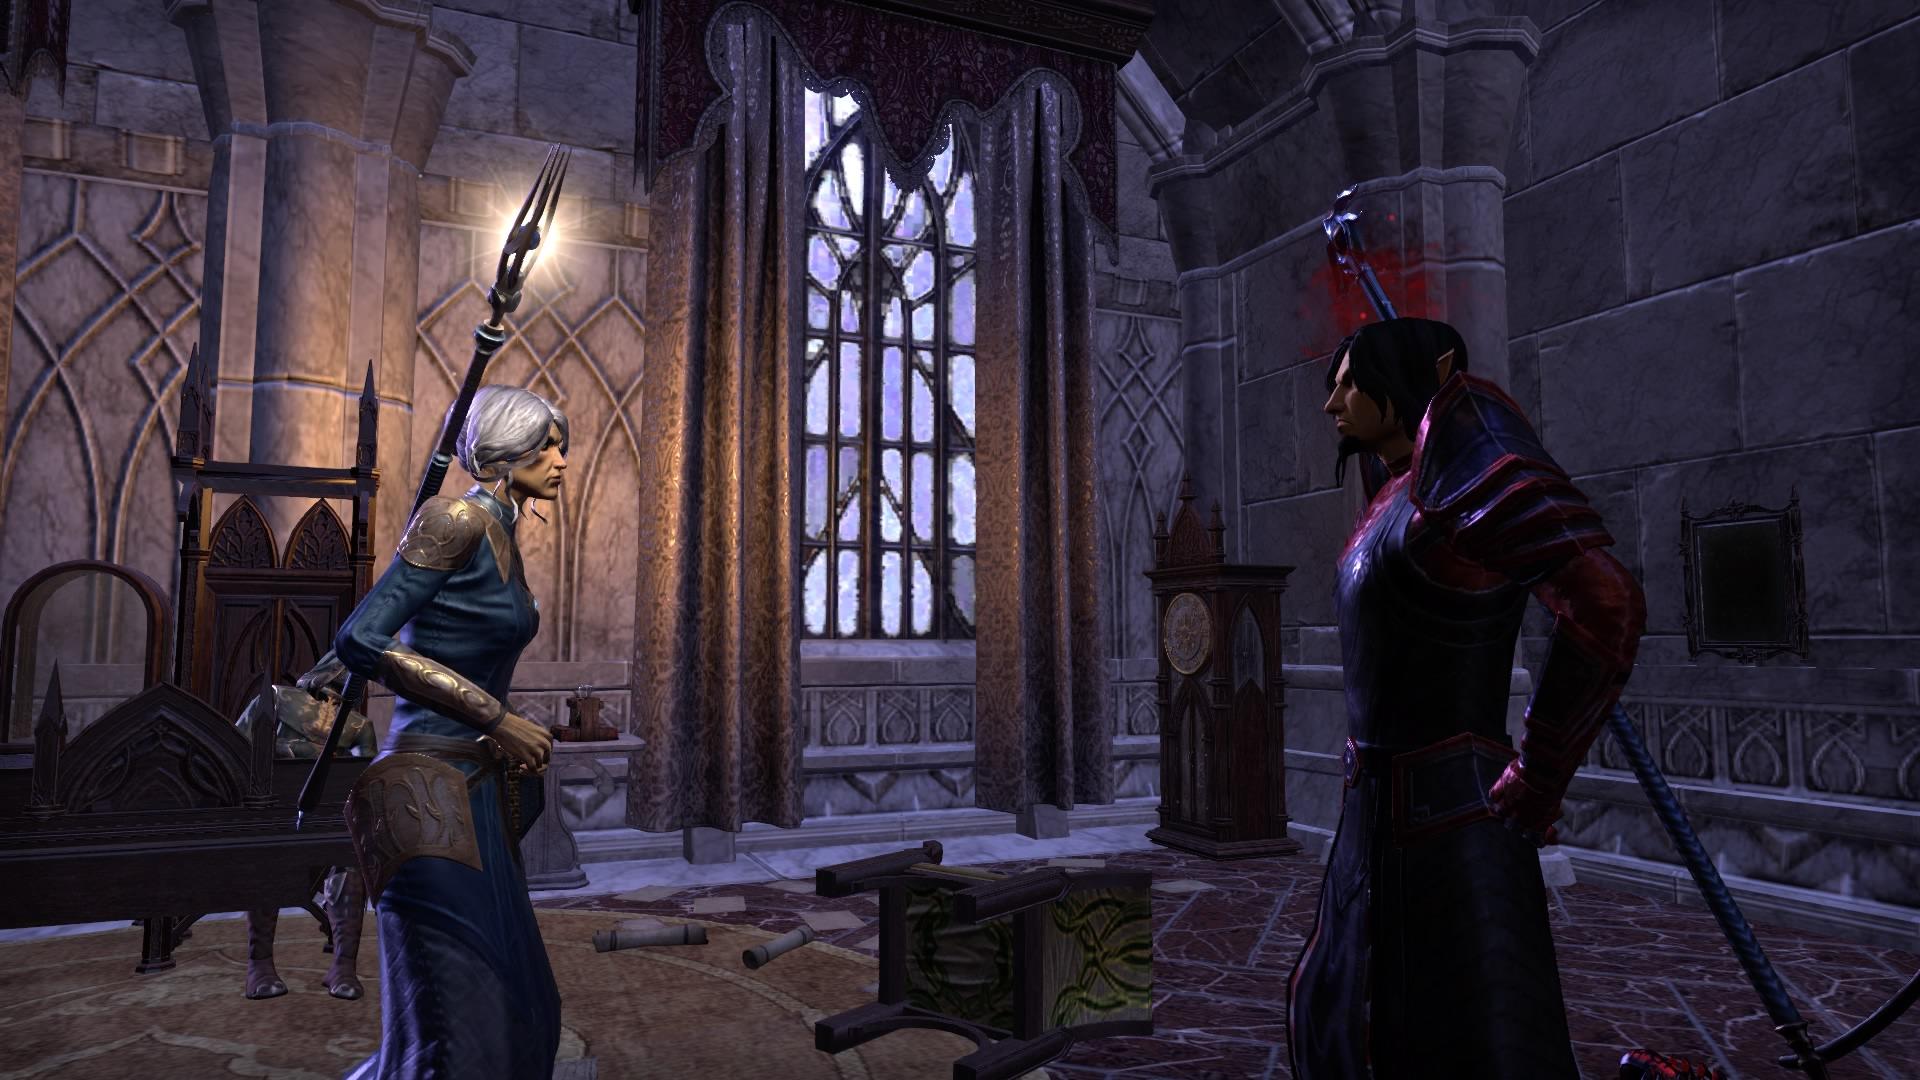 Valsirenn against her husband Leythen